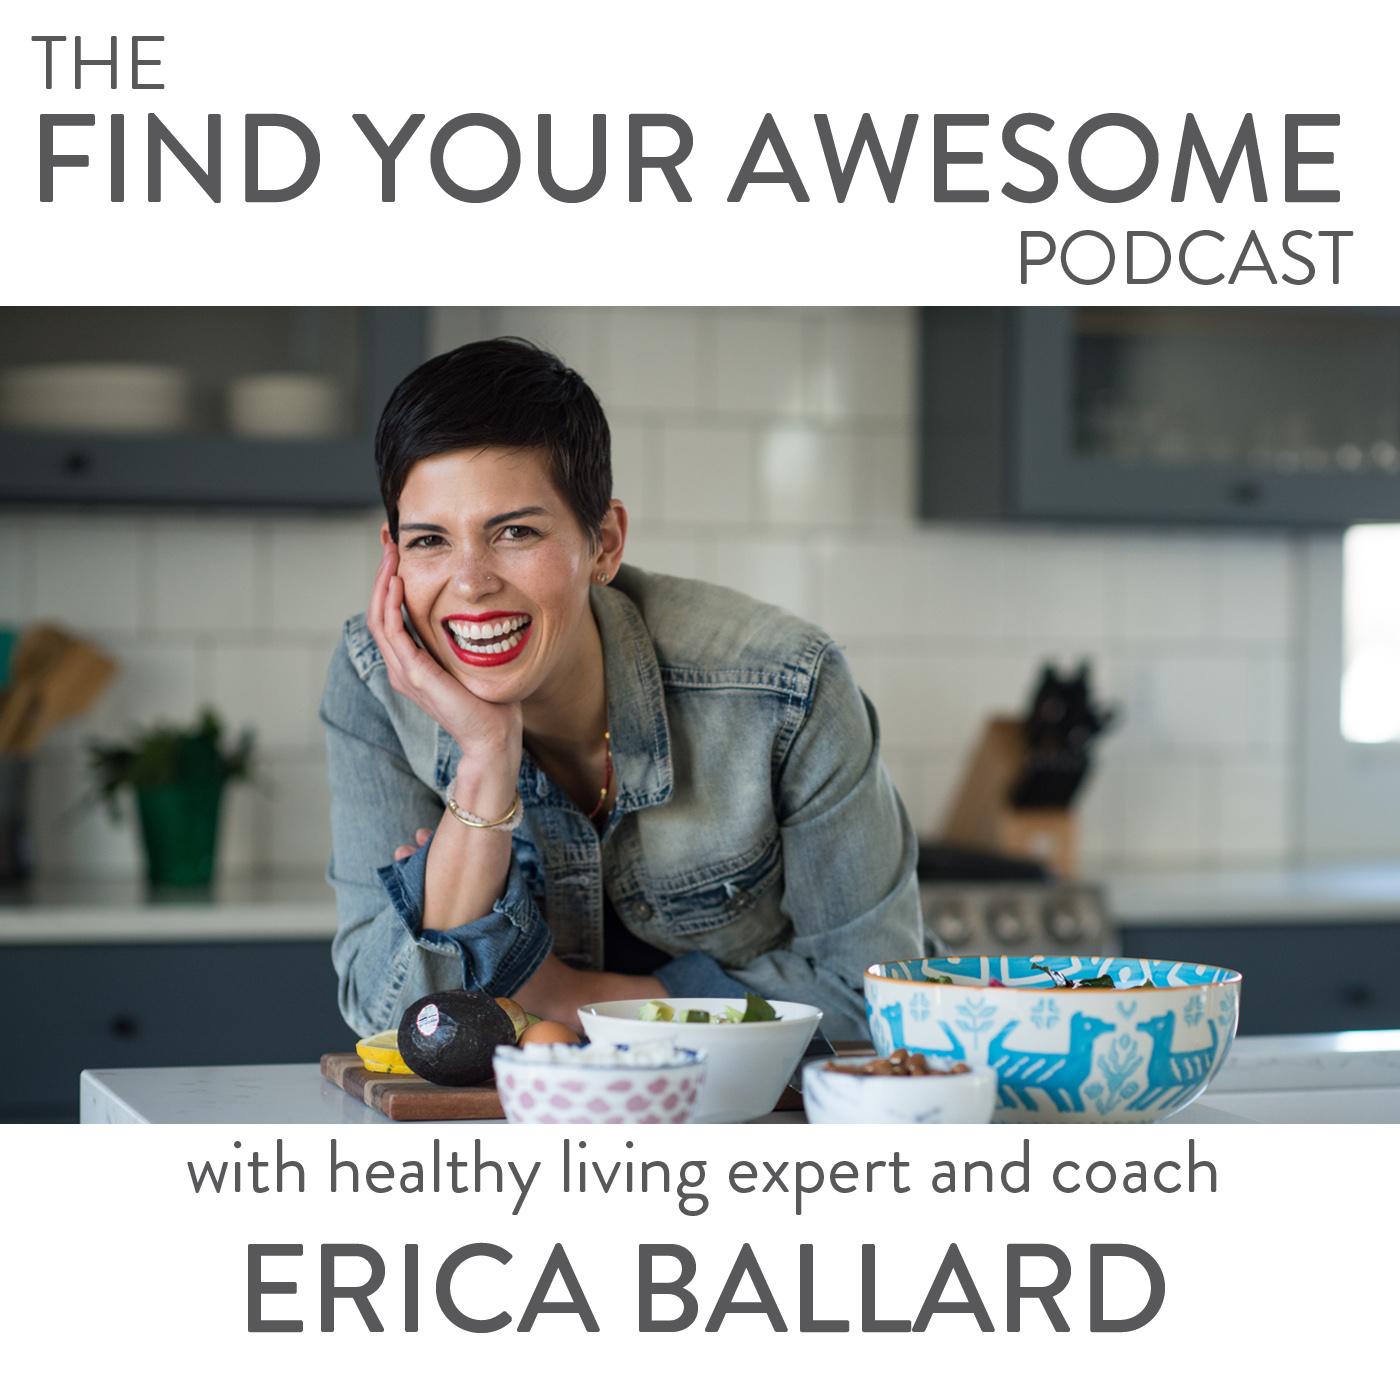 EricaBallard_podcast_coverart.jpg